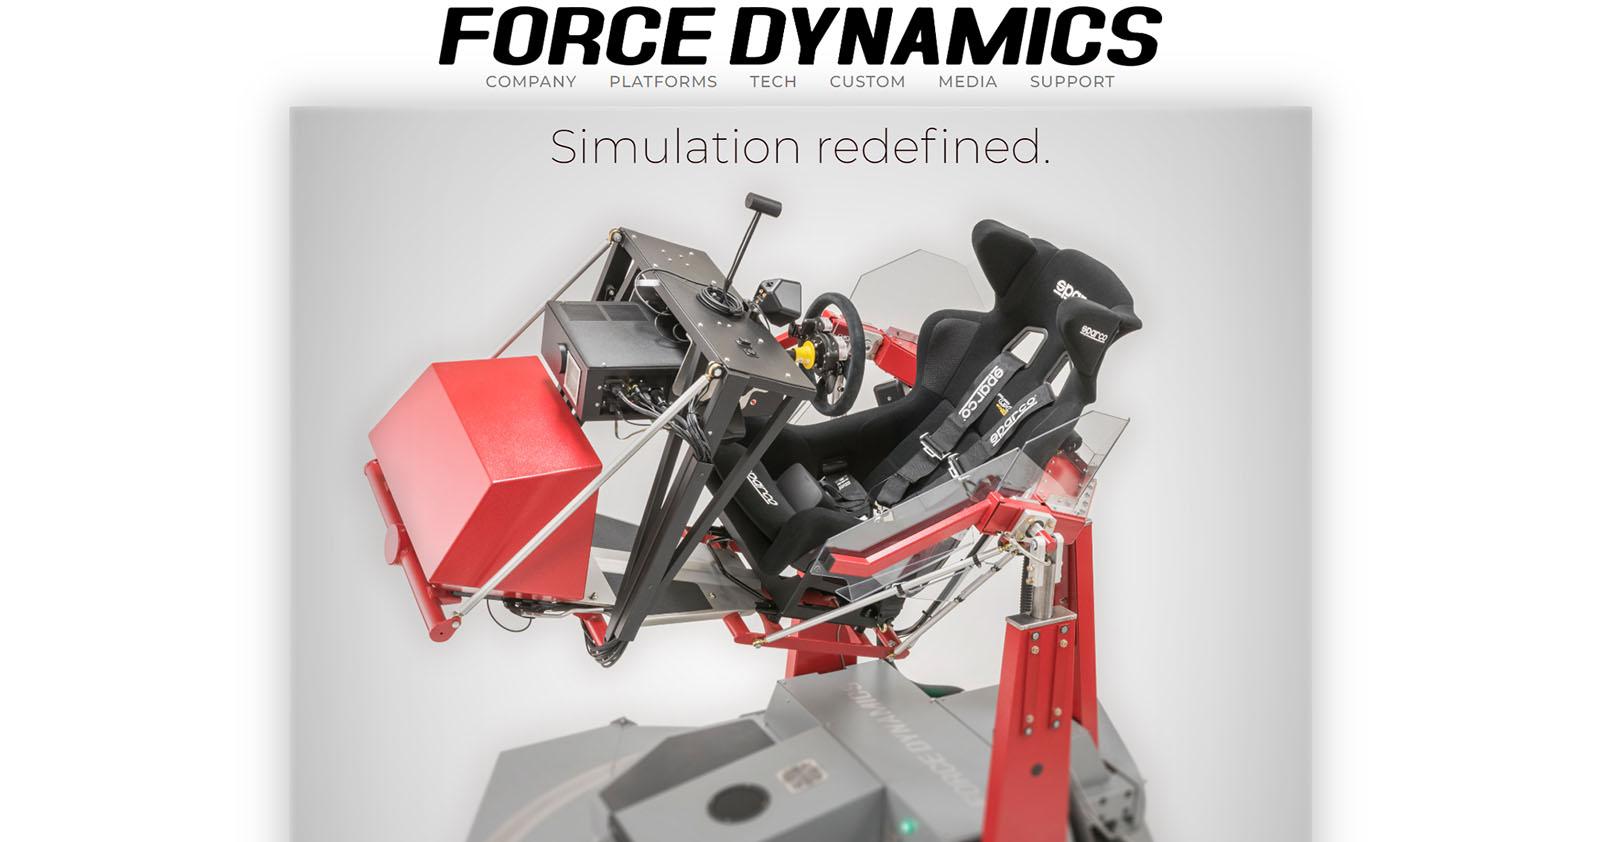 Force Dynamics - Racing simulator and motion platform design